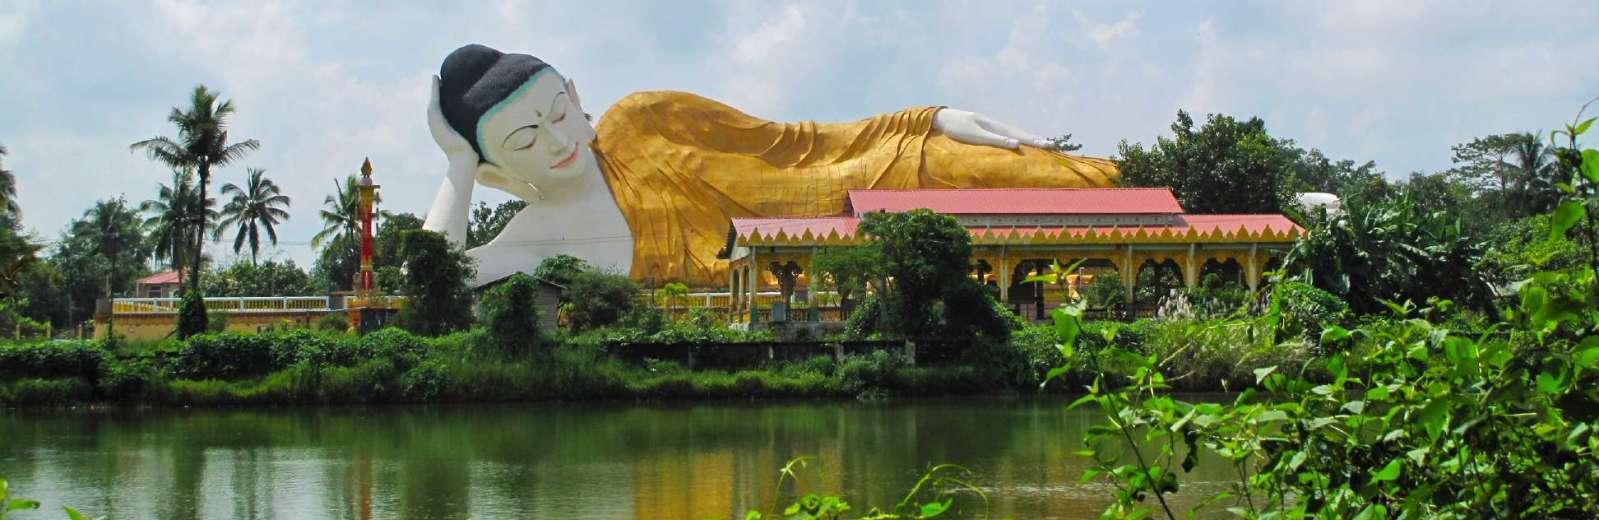 MONEDA DE 10 BAHT DE THAILANDIA 208ihc1